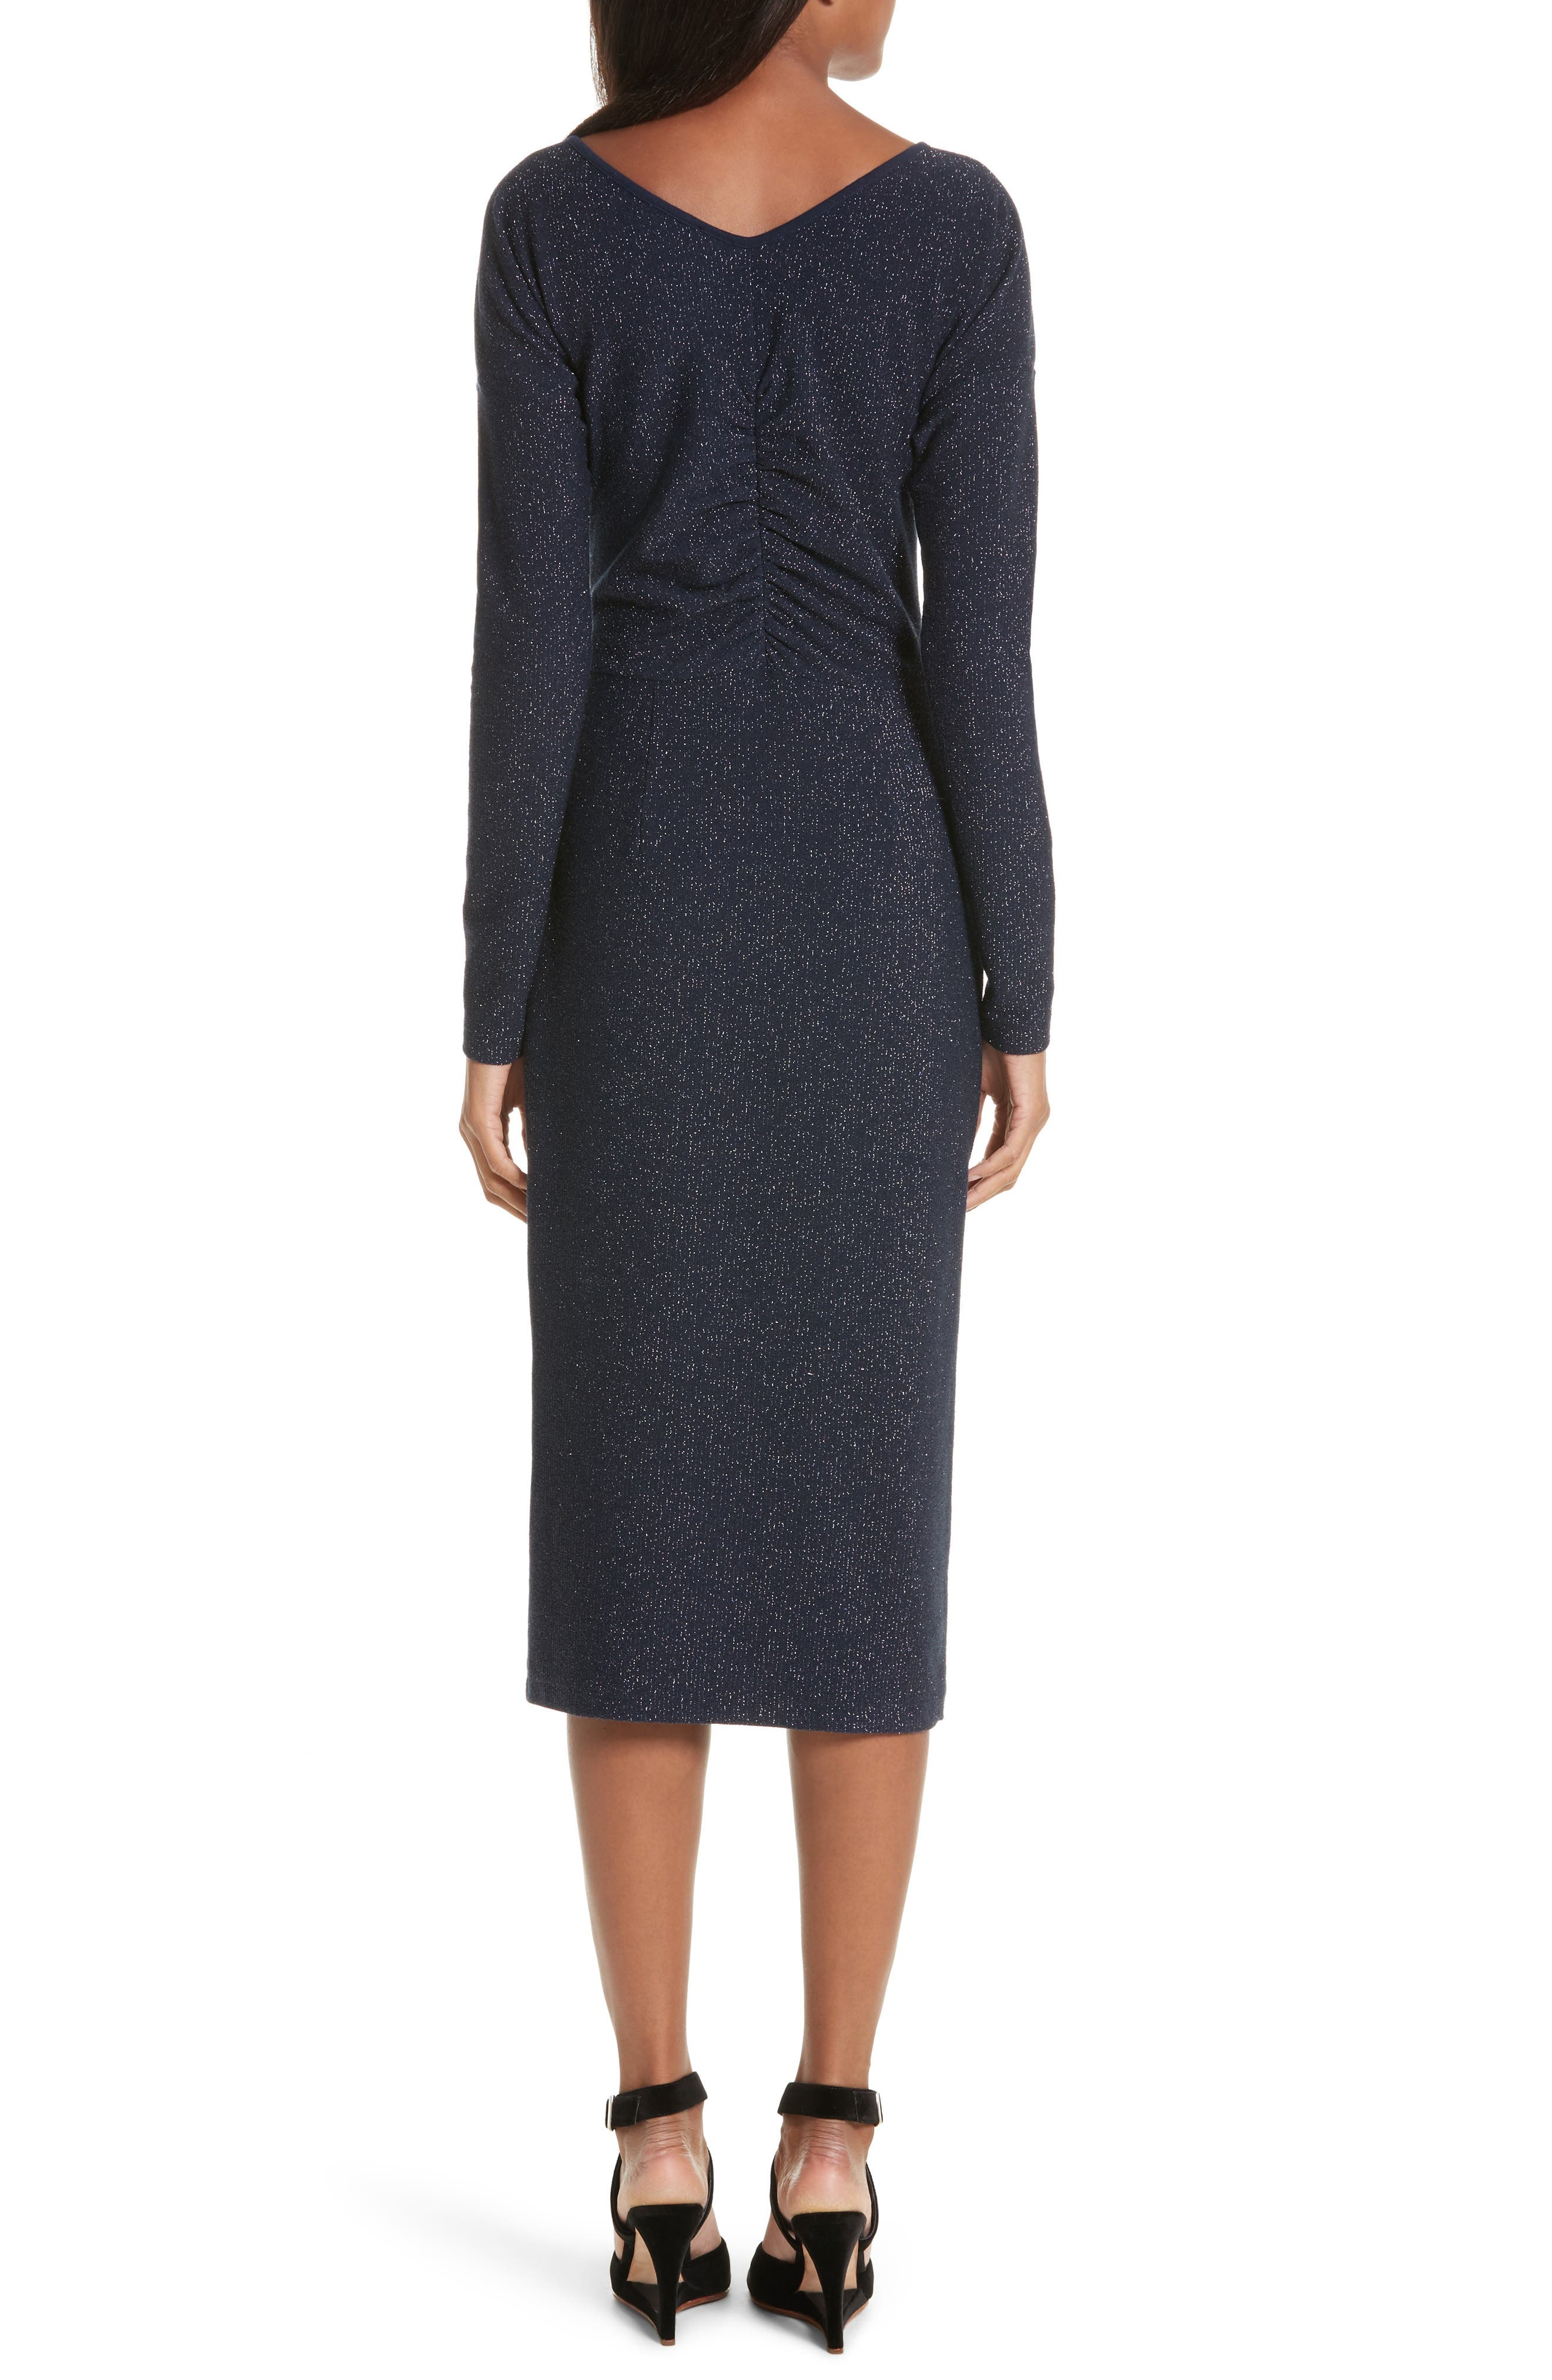 Temper Metallic Knit Dress,                             Alternate thumbnail 2, color,                             401